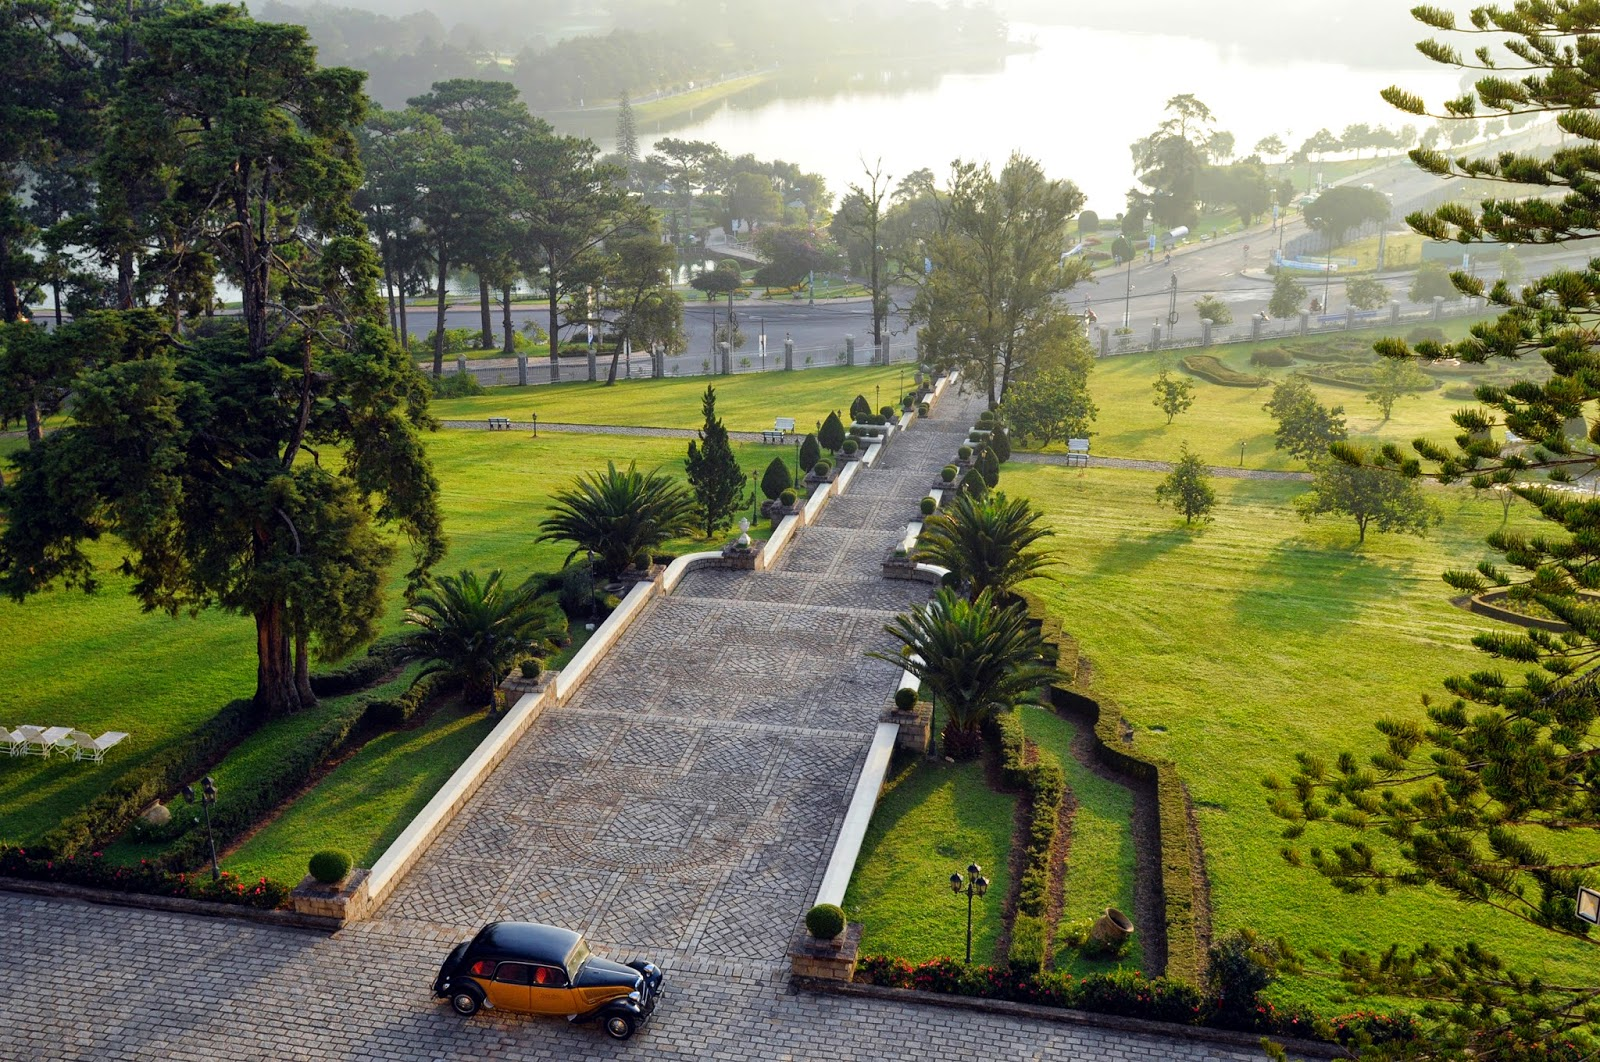 Xuanhuong park.